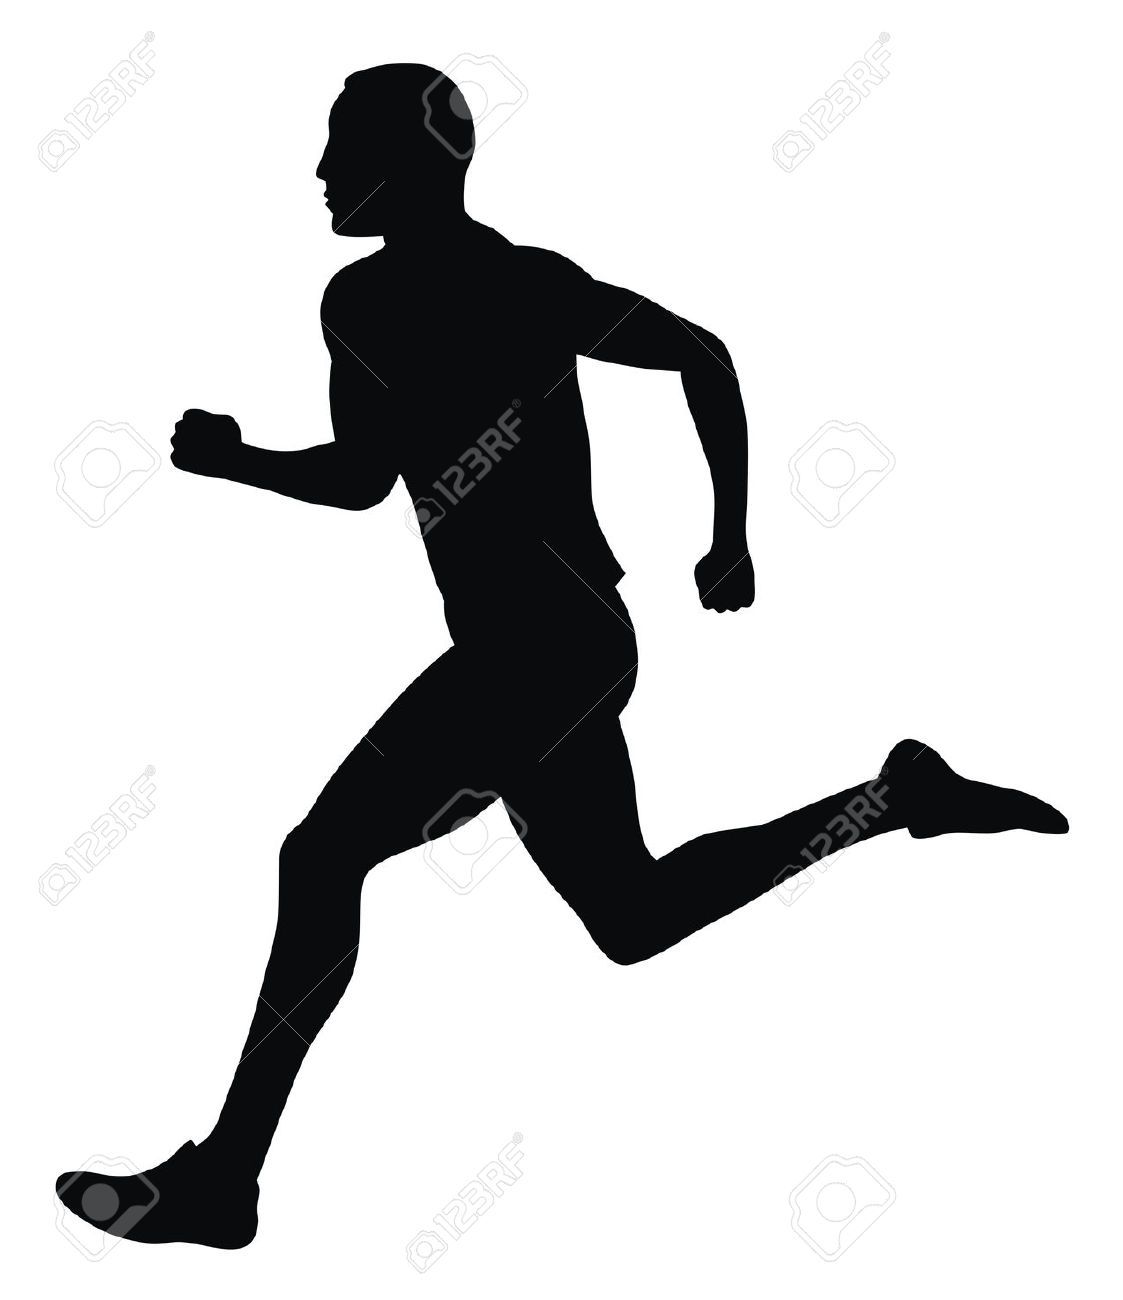 4506982 Abstract Vector Illustration Of Marathon Runner Stock Vector Runner Running Silhouette Jpg 1123 1300 Running Tattoo Silhouette Sports Images